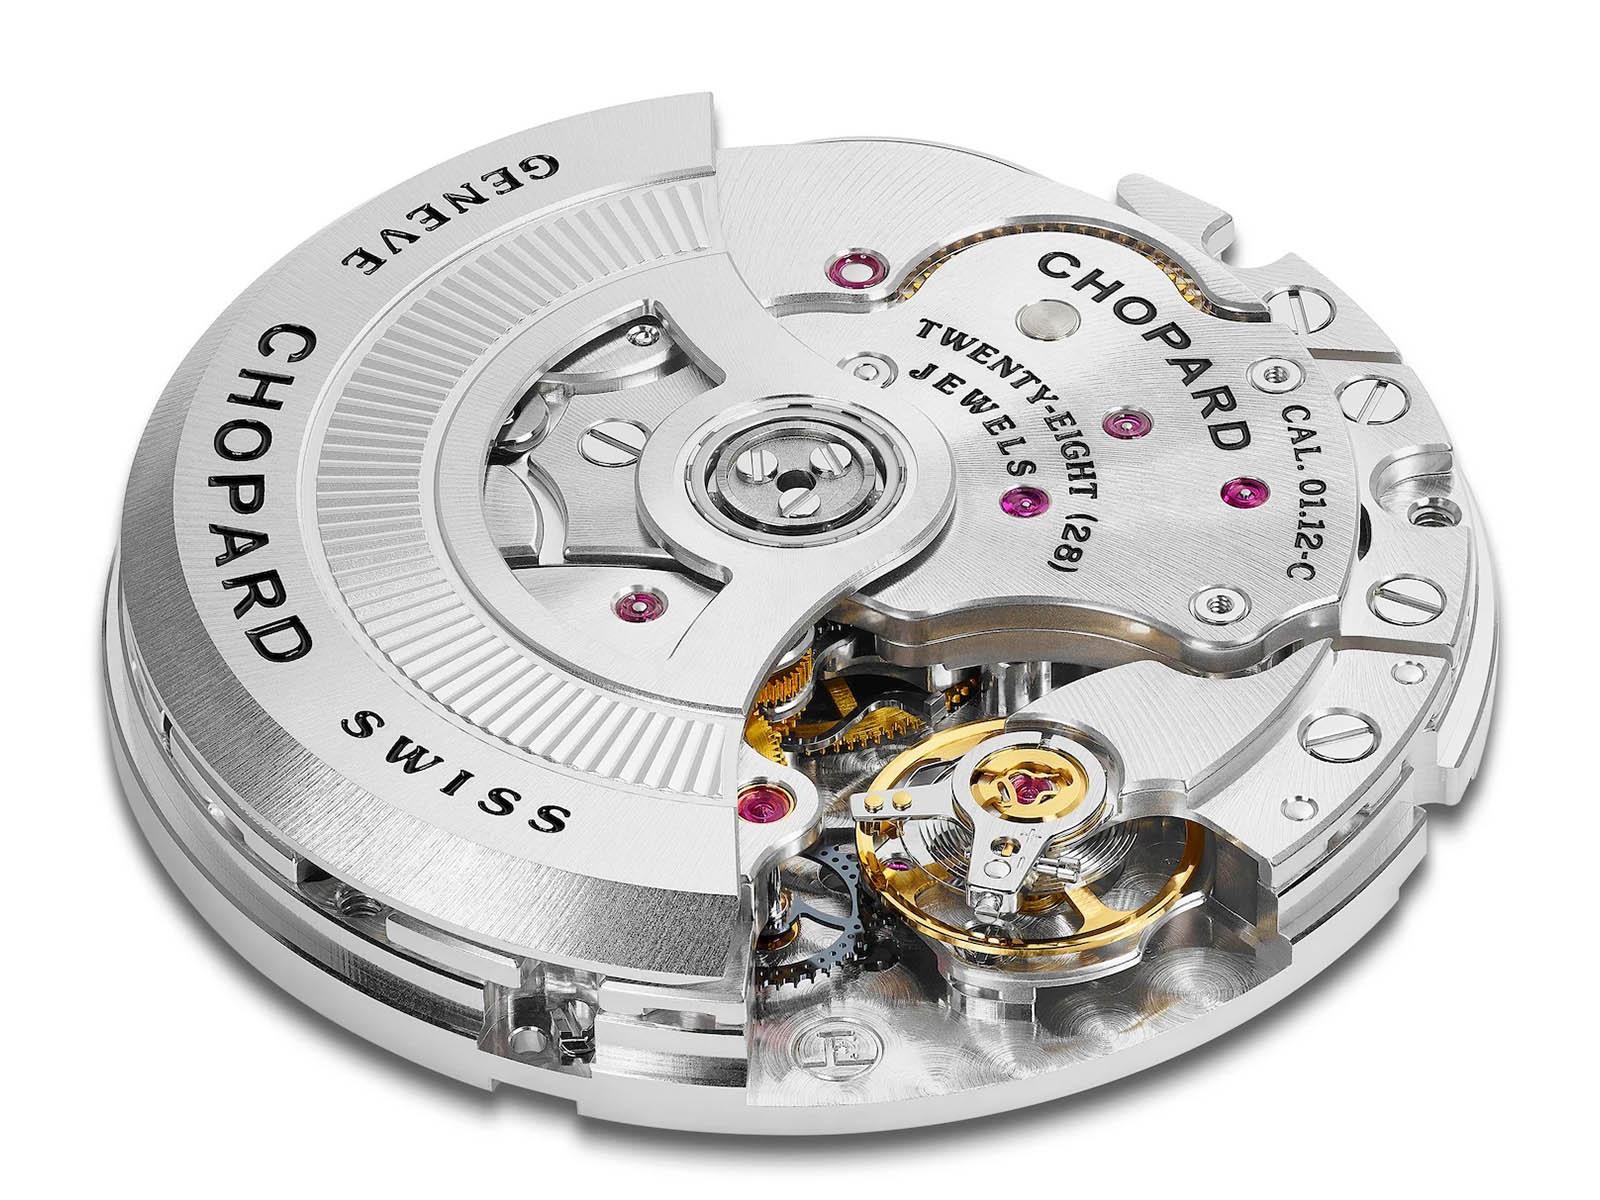 298600-3005-chopard-alpine-eagle-cadence-8hf-titanium-8.jpg